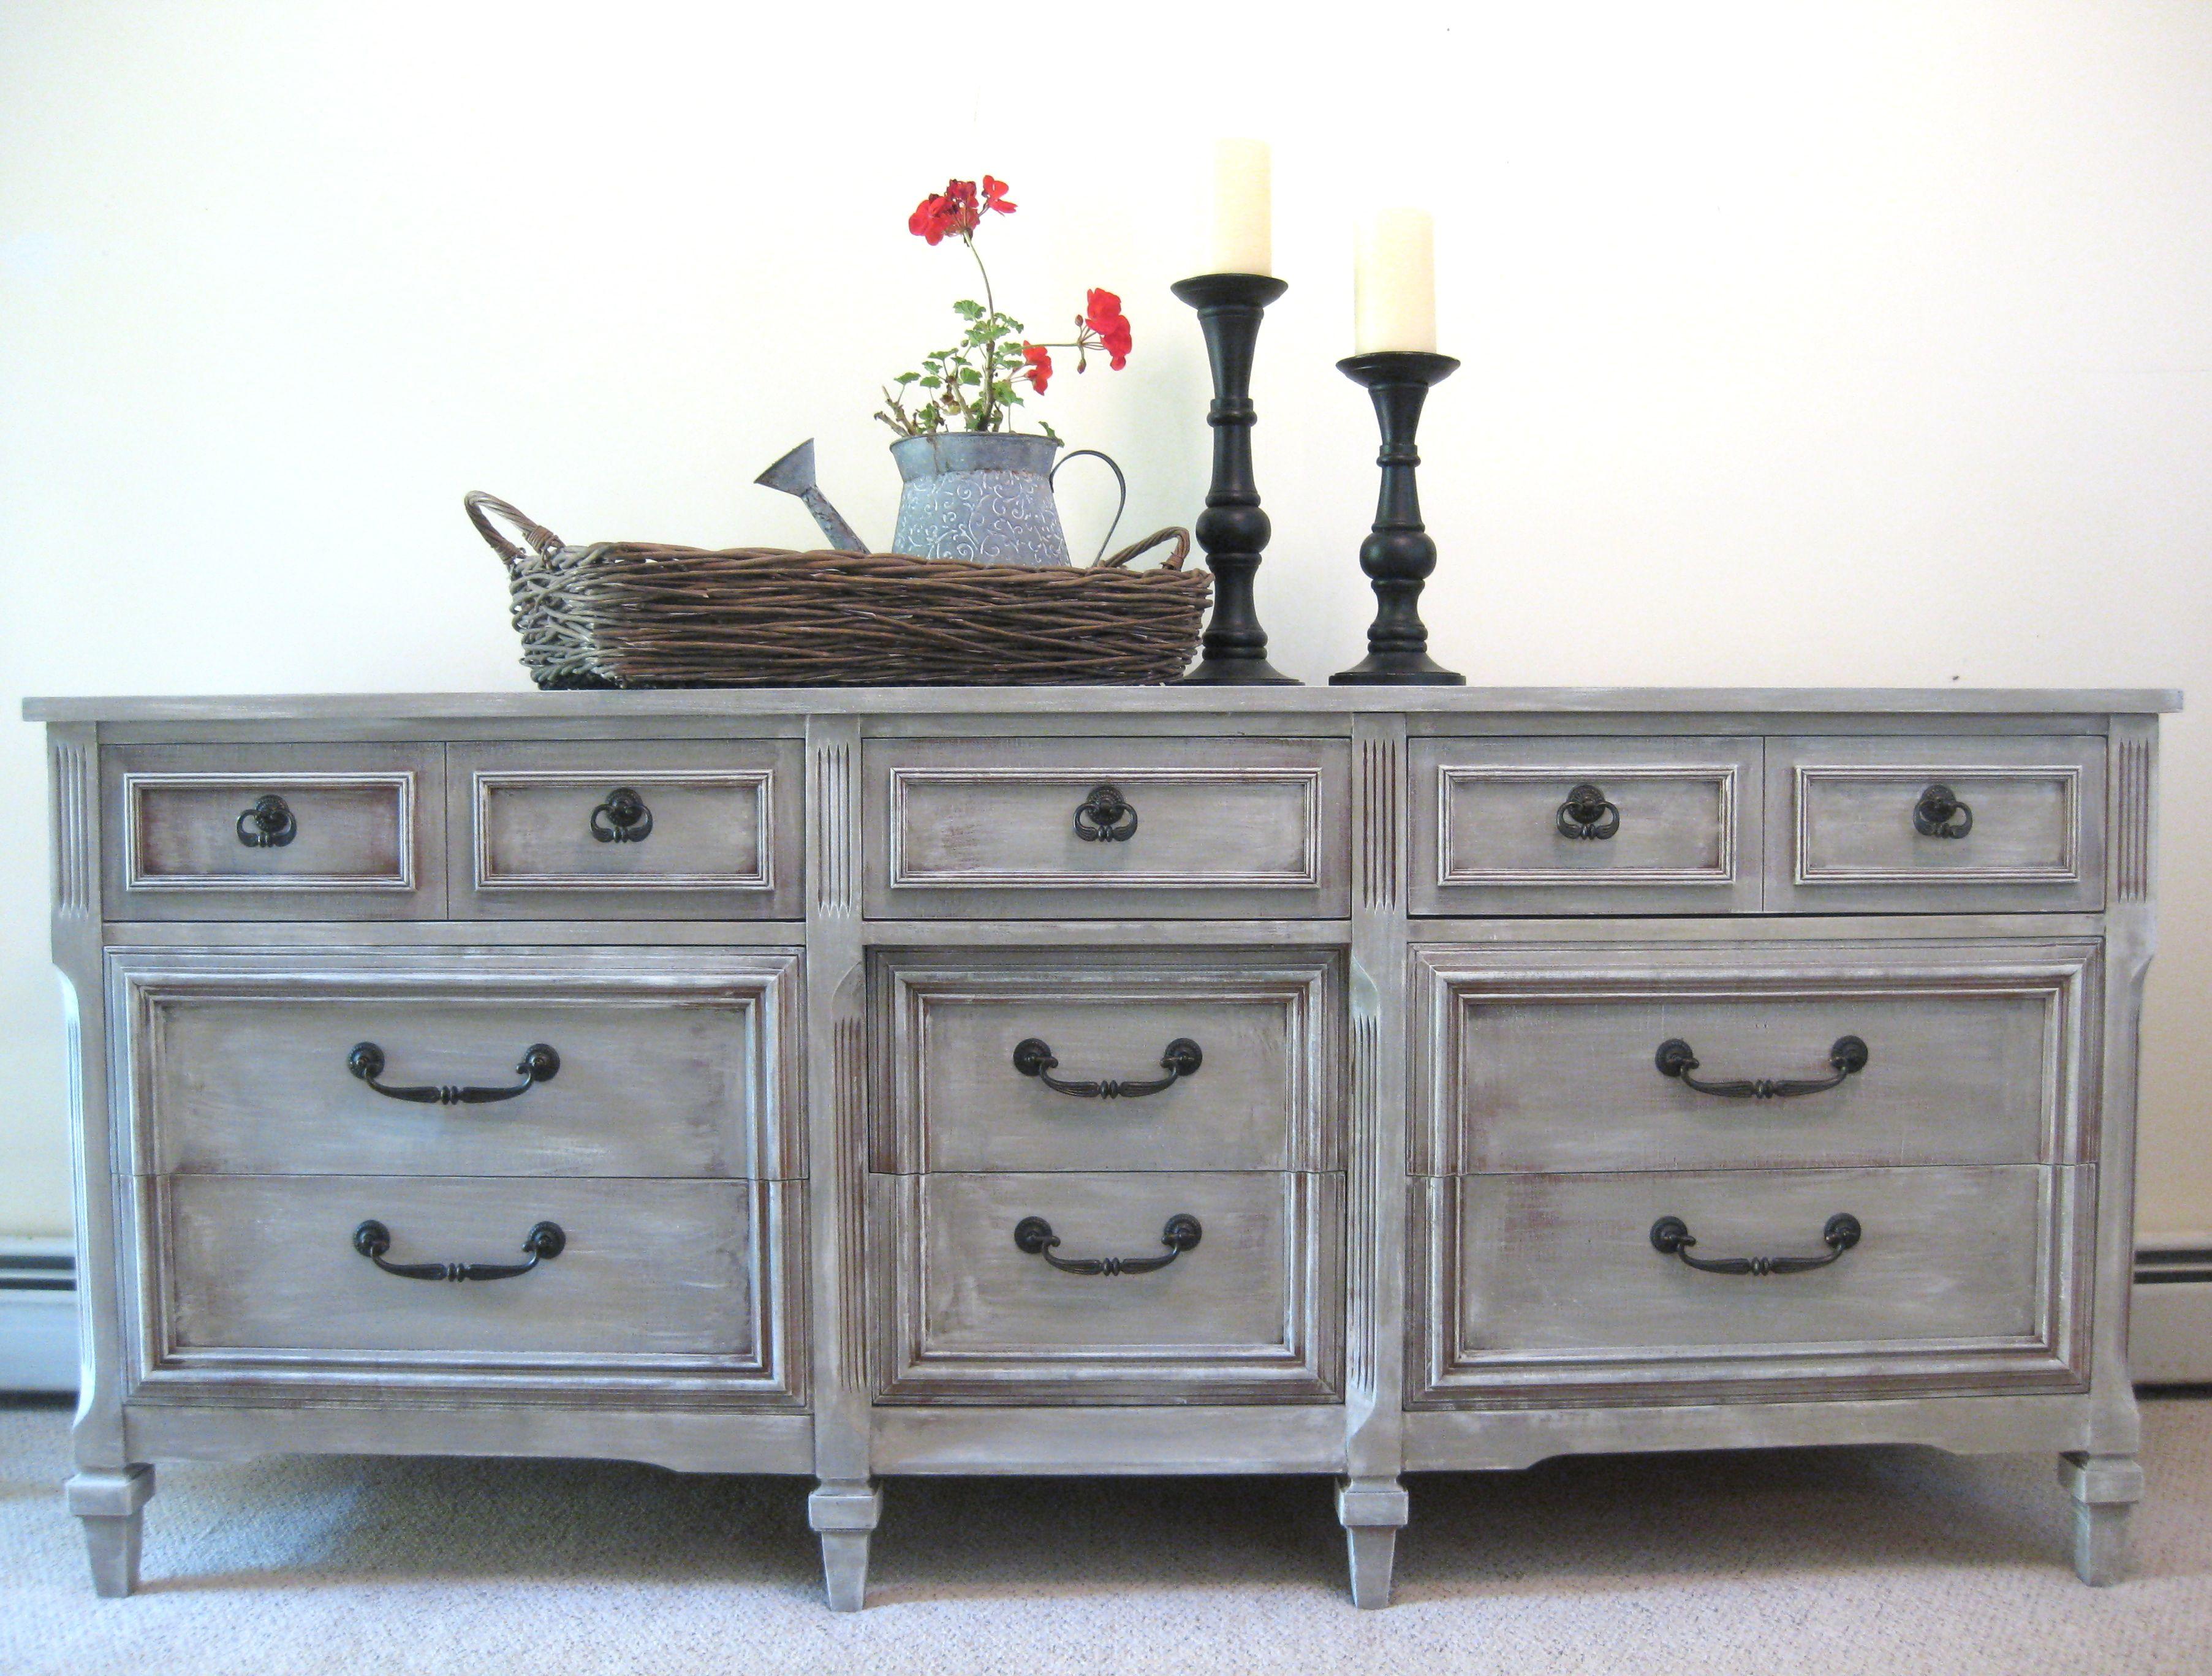 Annie sloan french linen painted dresser recamar s y for Recamaras y comedores